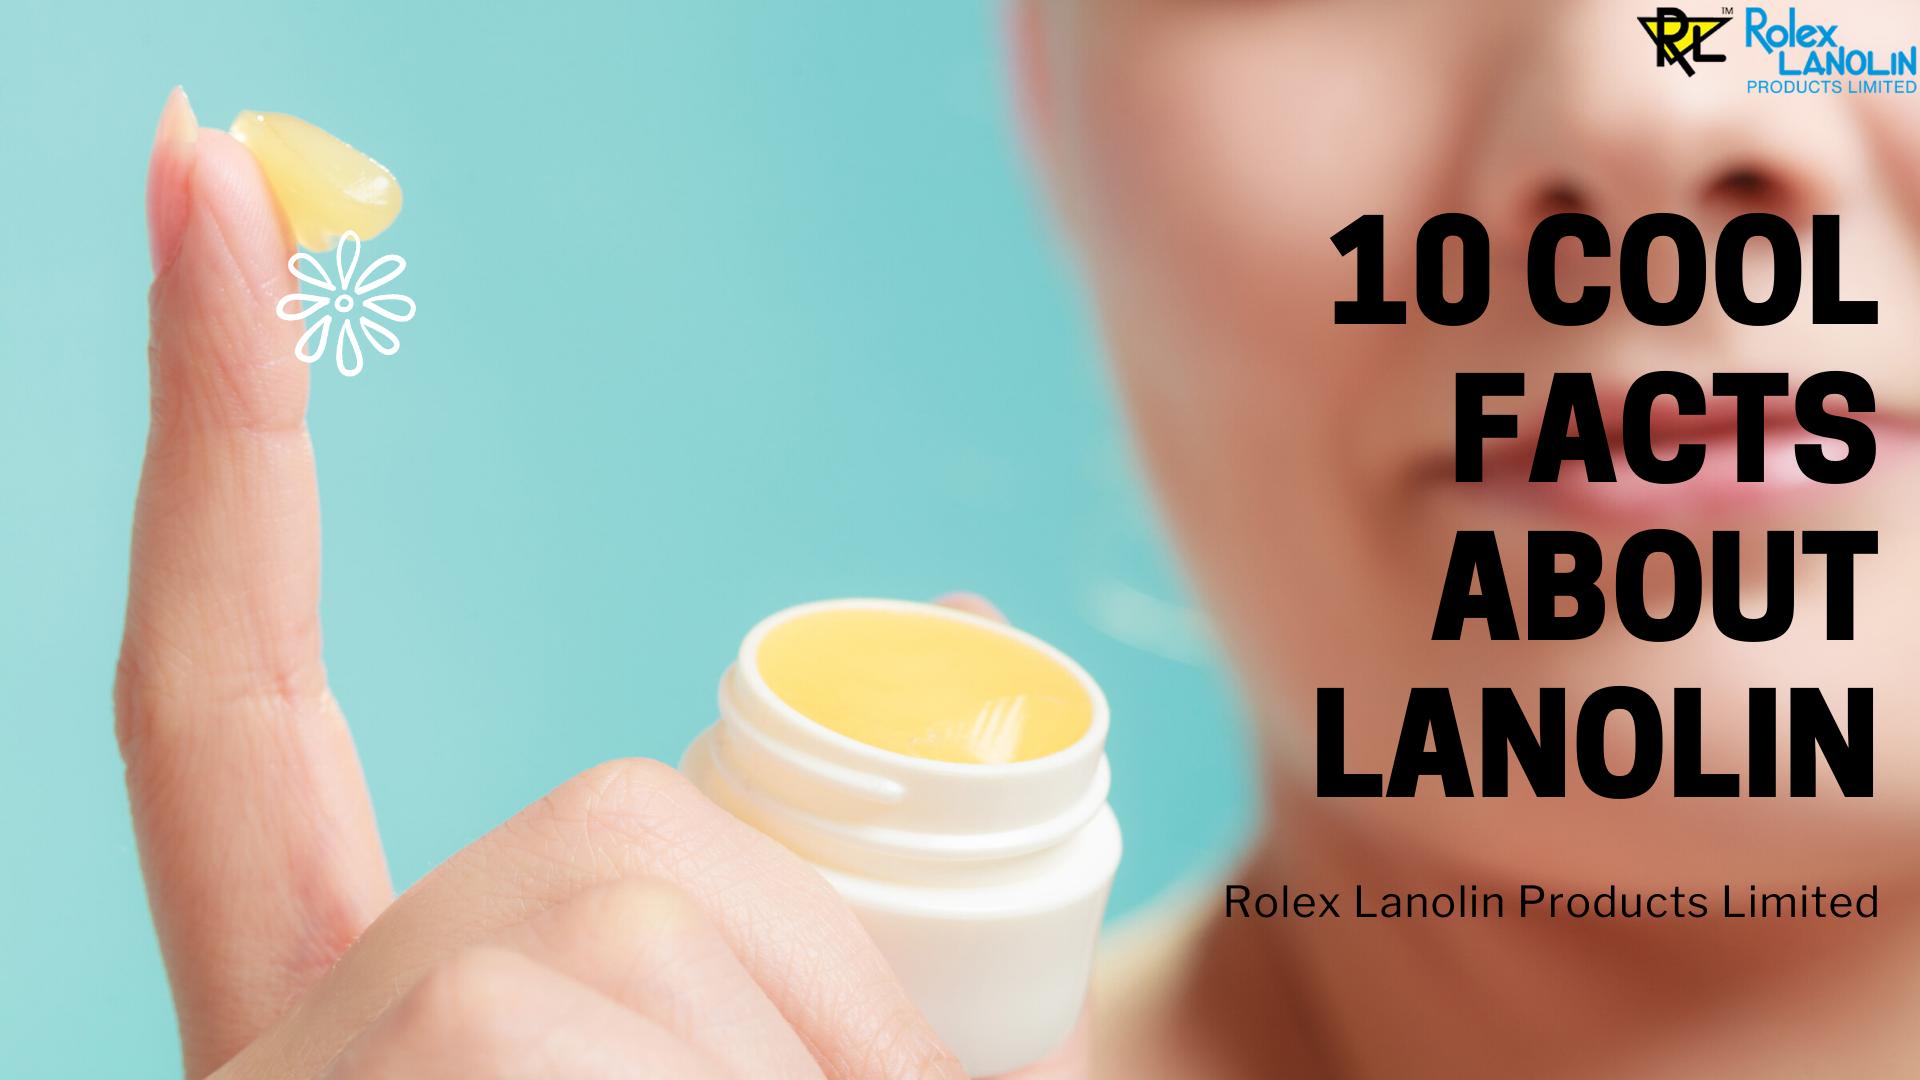 Lanolin For Breastfeeding Organic Lanolin Cream Top Myth Rolex Lanolin Products Limited In 2020 Lanolin Lanolin Cream Diy Body Care